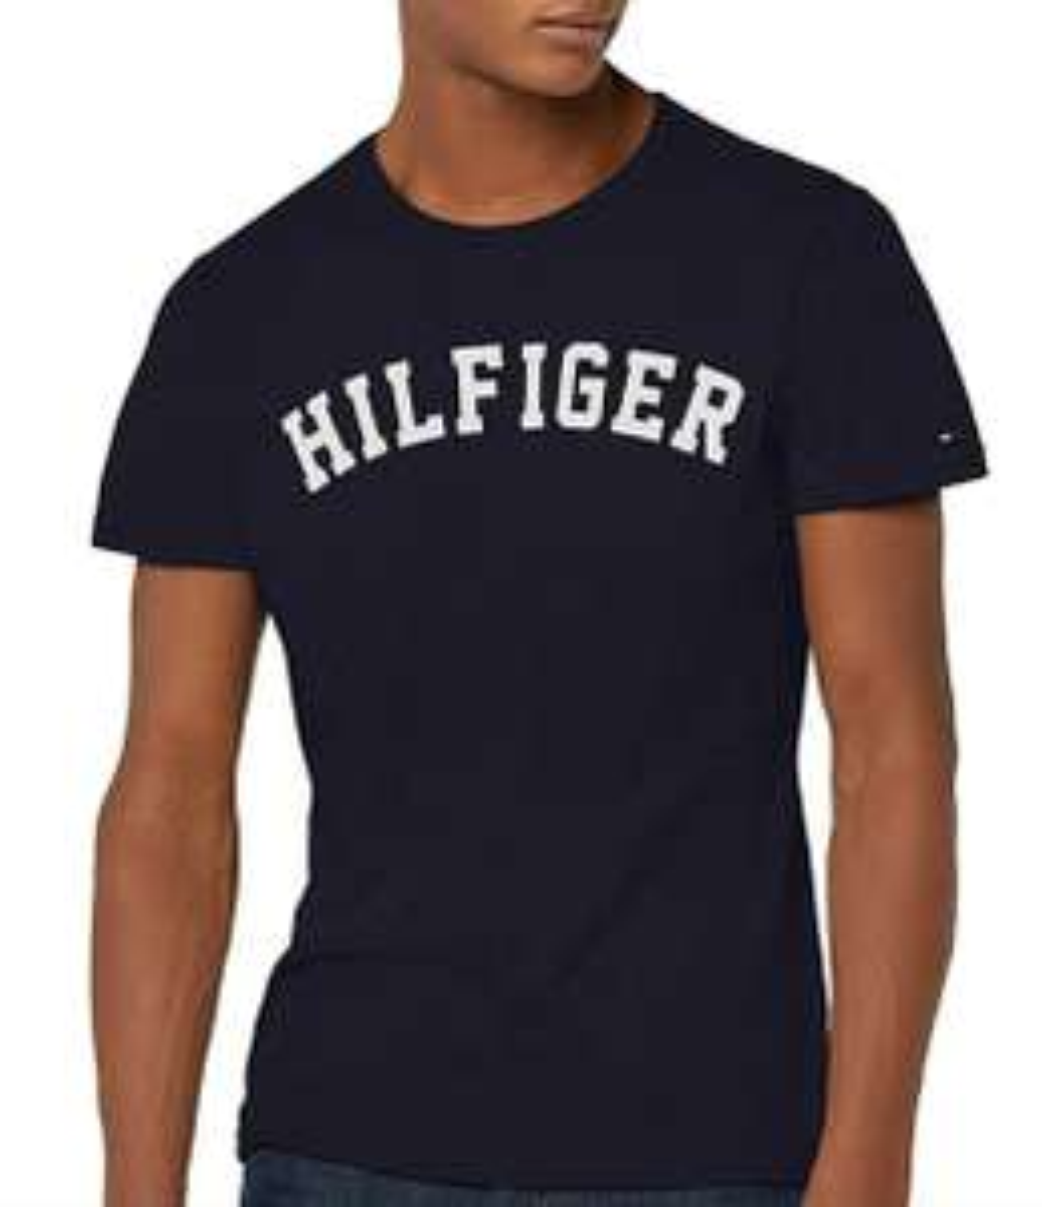 Tommy Hilfiger Men's SS Tee Logo T-shirt - £7 Prime (+£4.49 non-Prime) @ Amazon